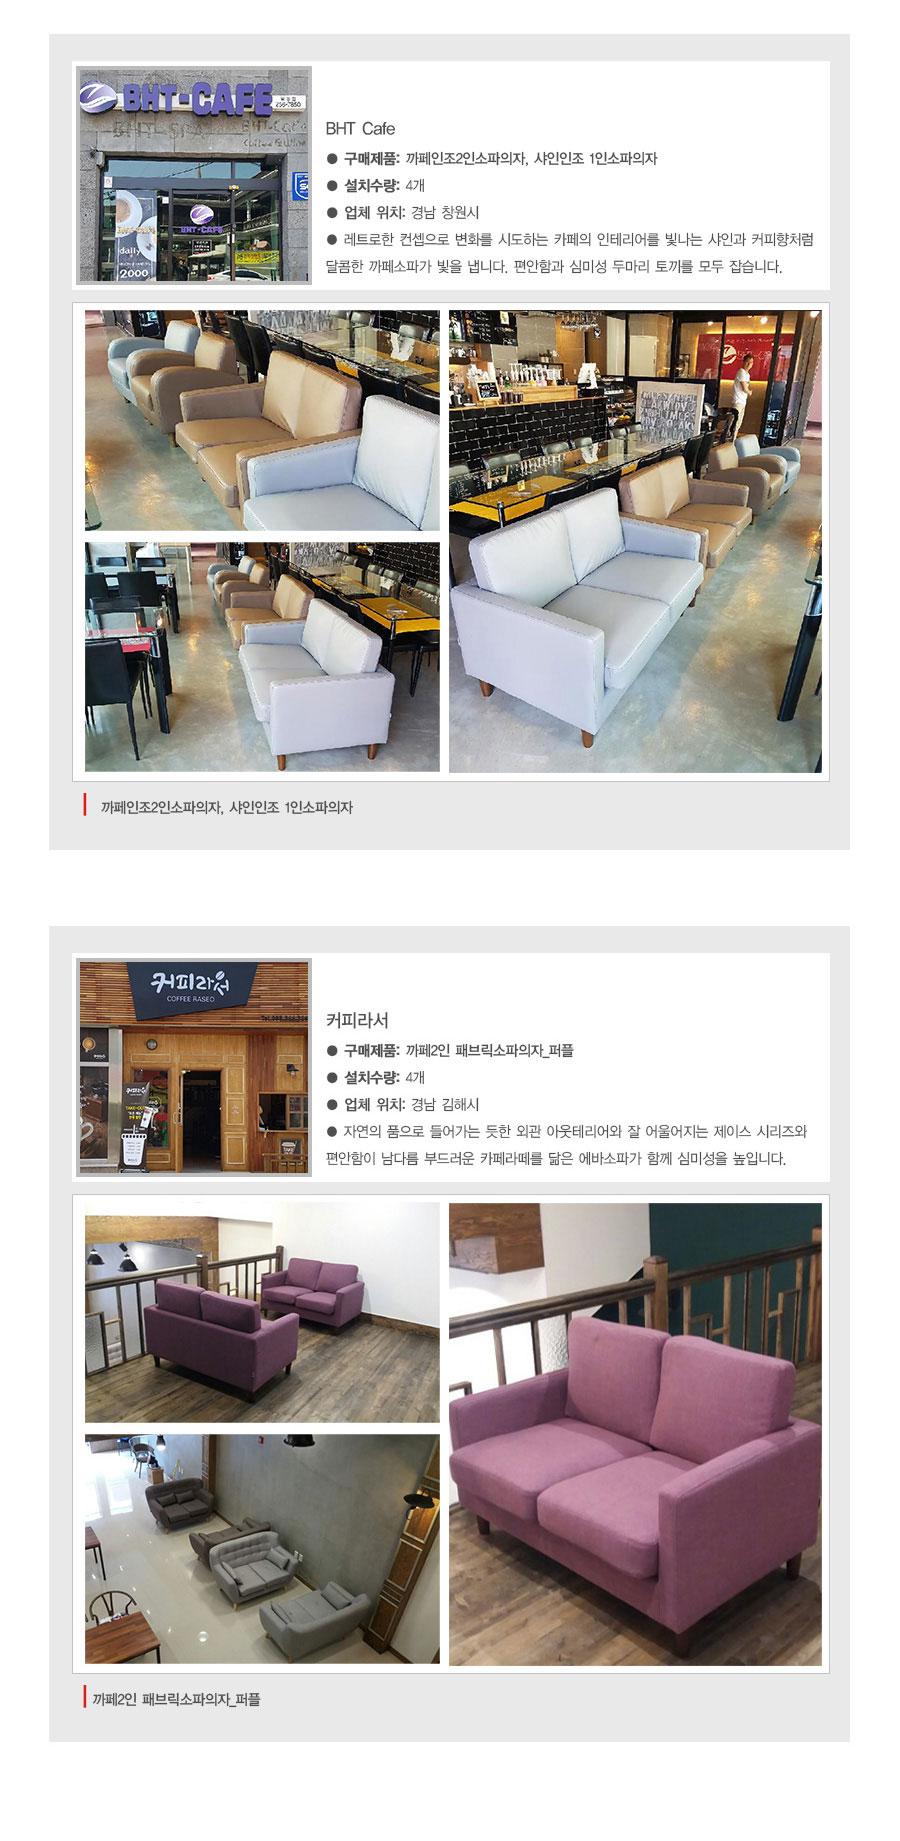 foot_cafe-2p.jpg